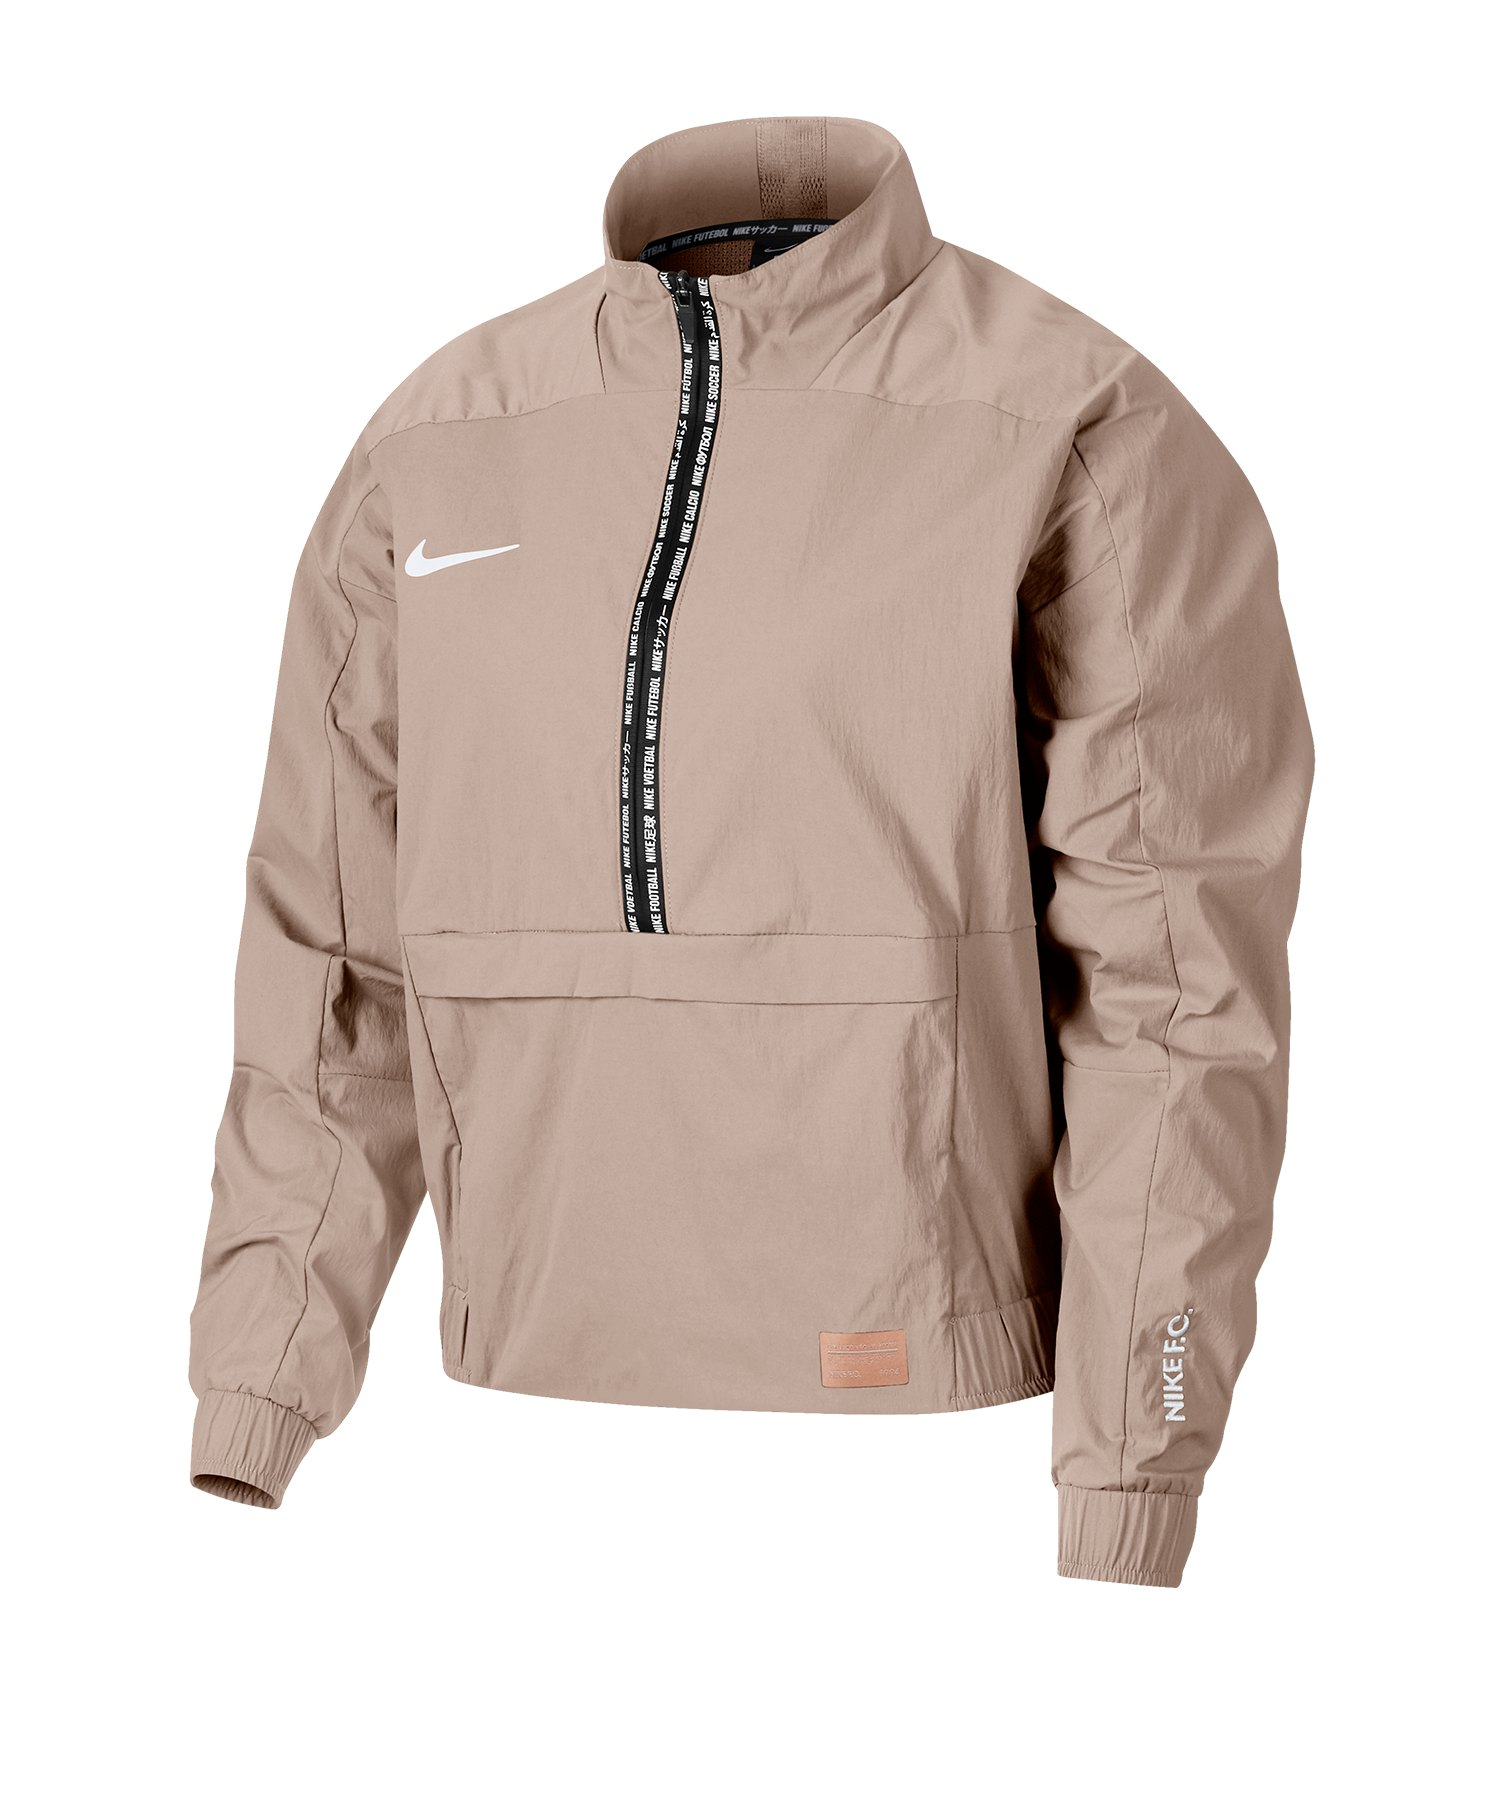 Nike F.C. Crop Jacket Jacke Damen Rosa F838